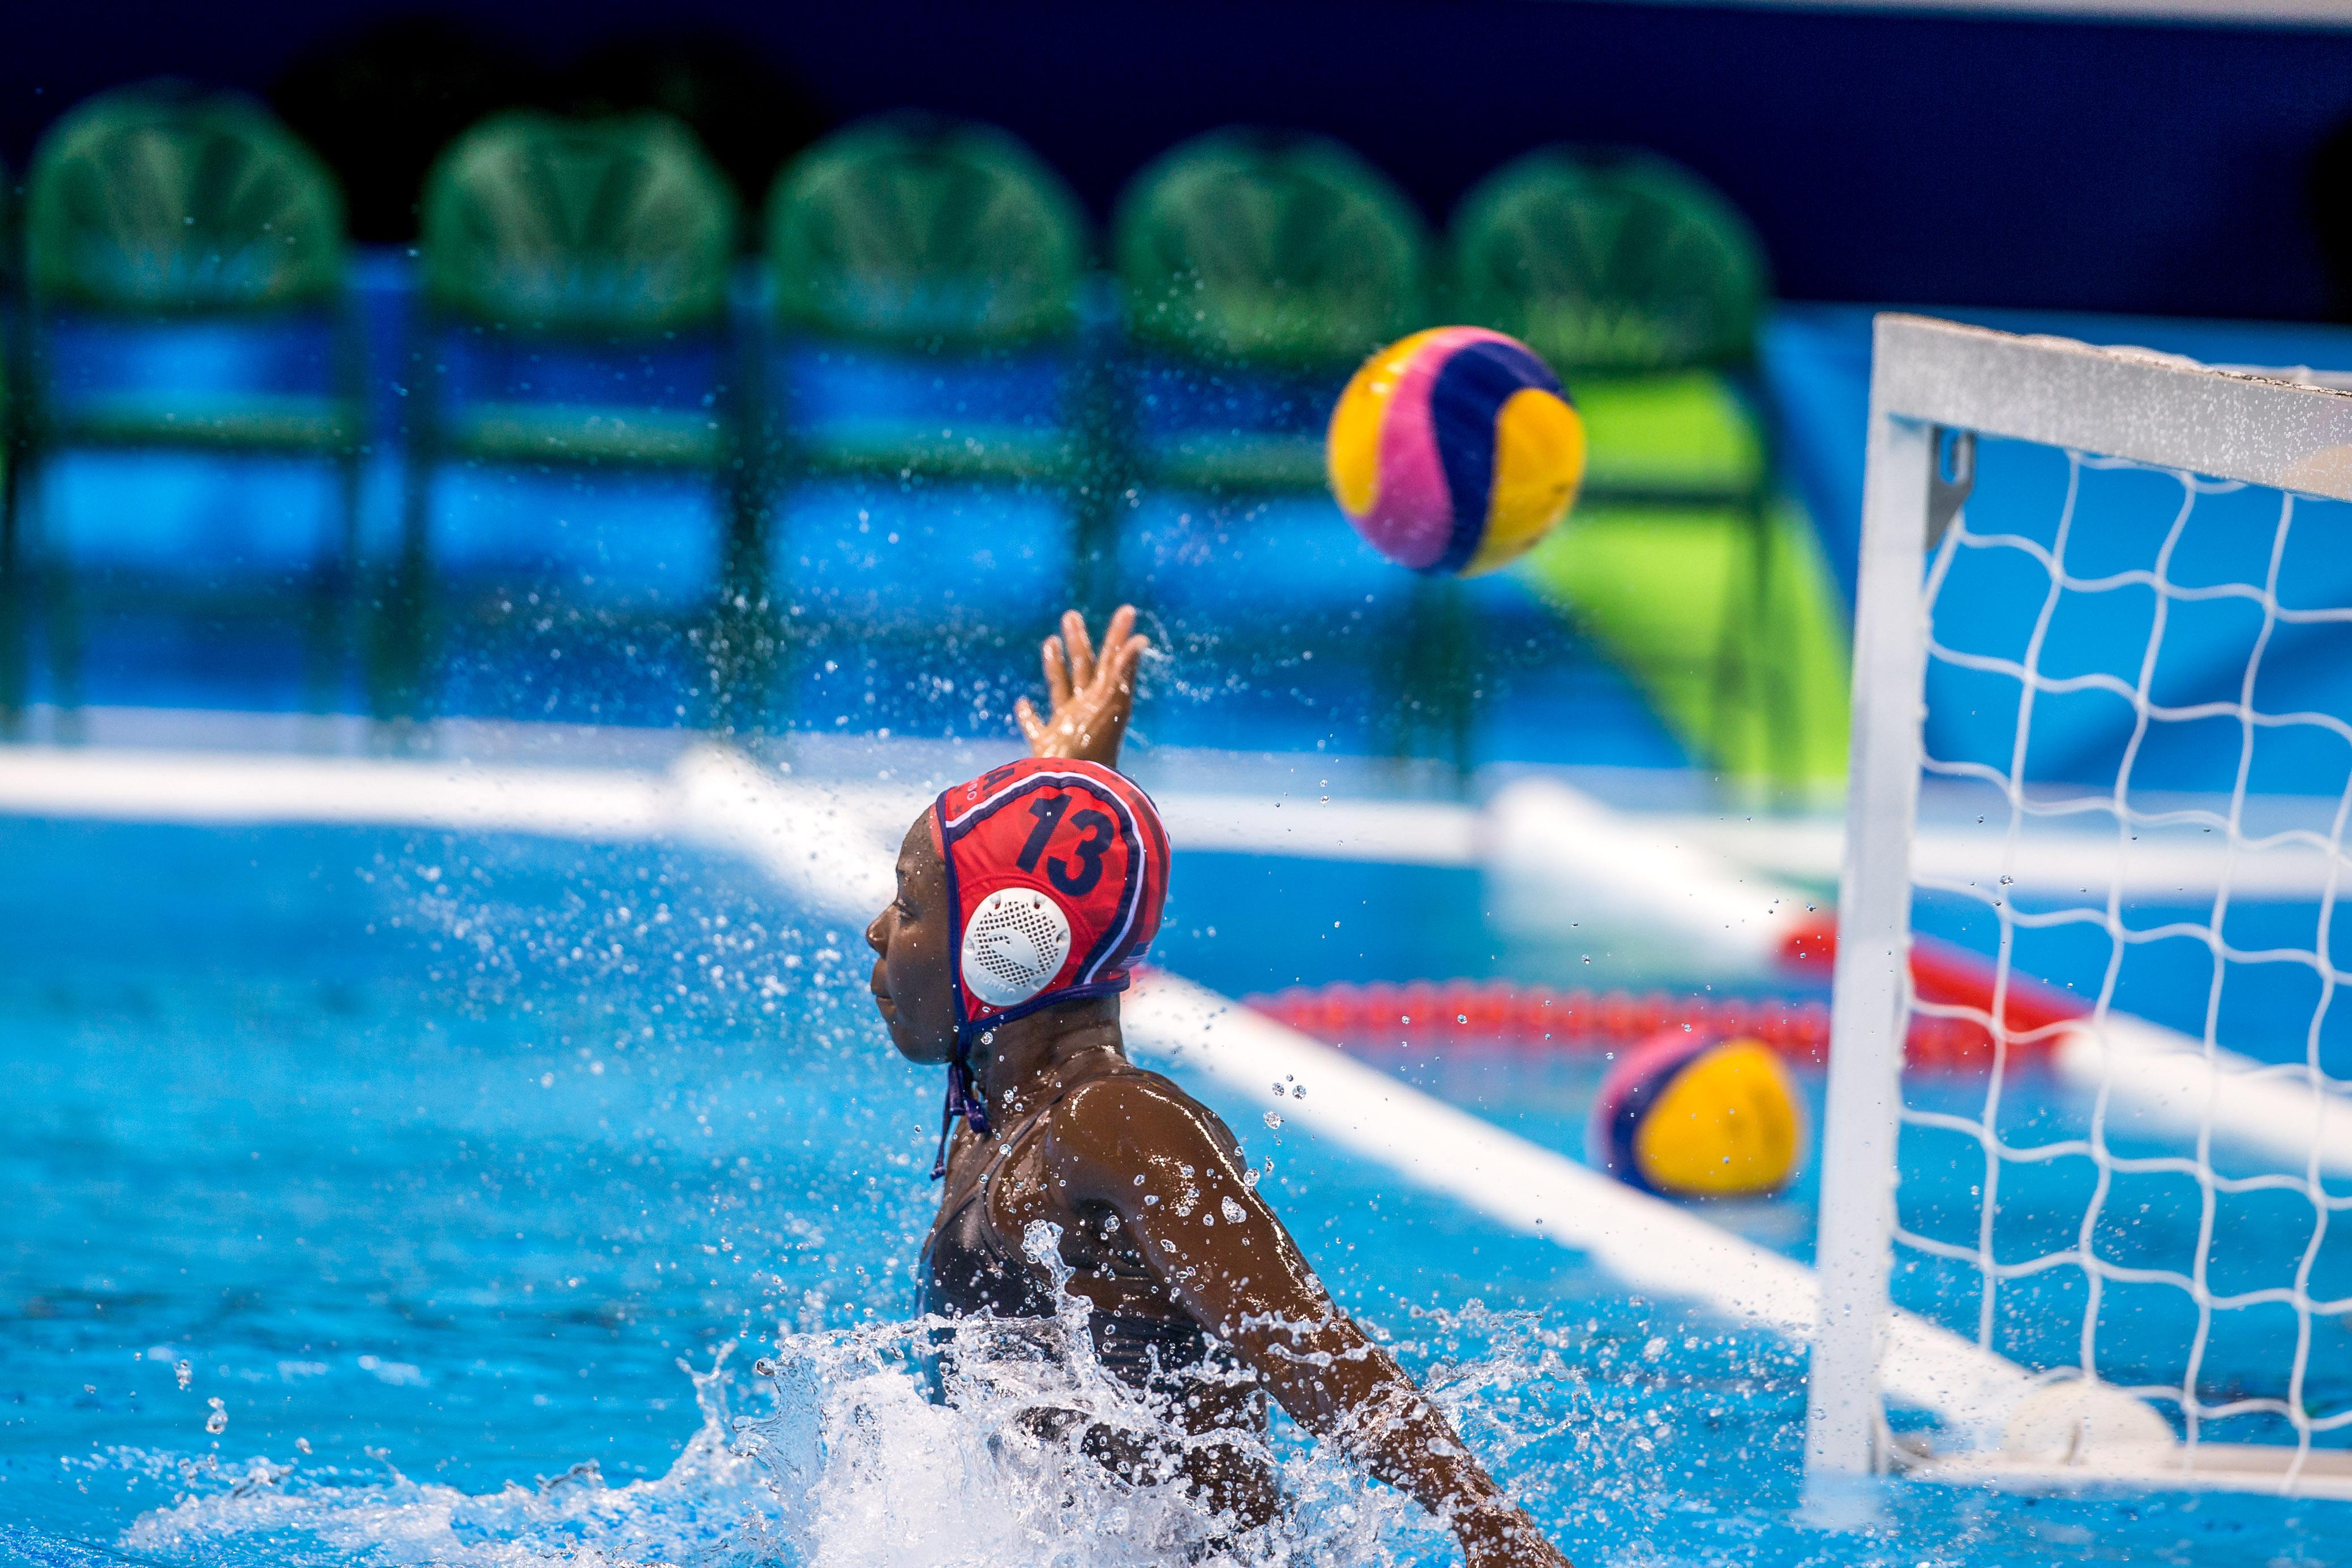 8a14b7408c6 water person girl woman sport play wet summer recreation pool splash  swimming pool training swimming swimmer